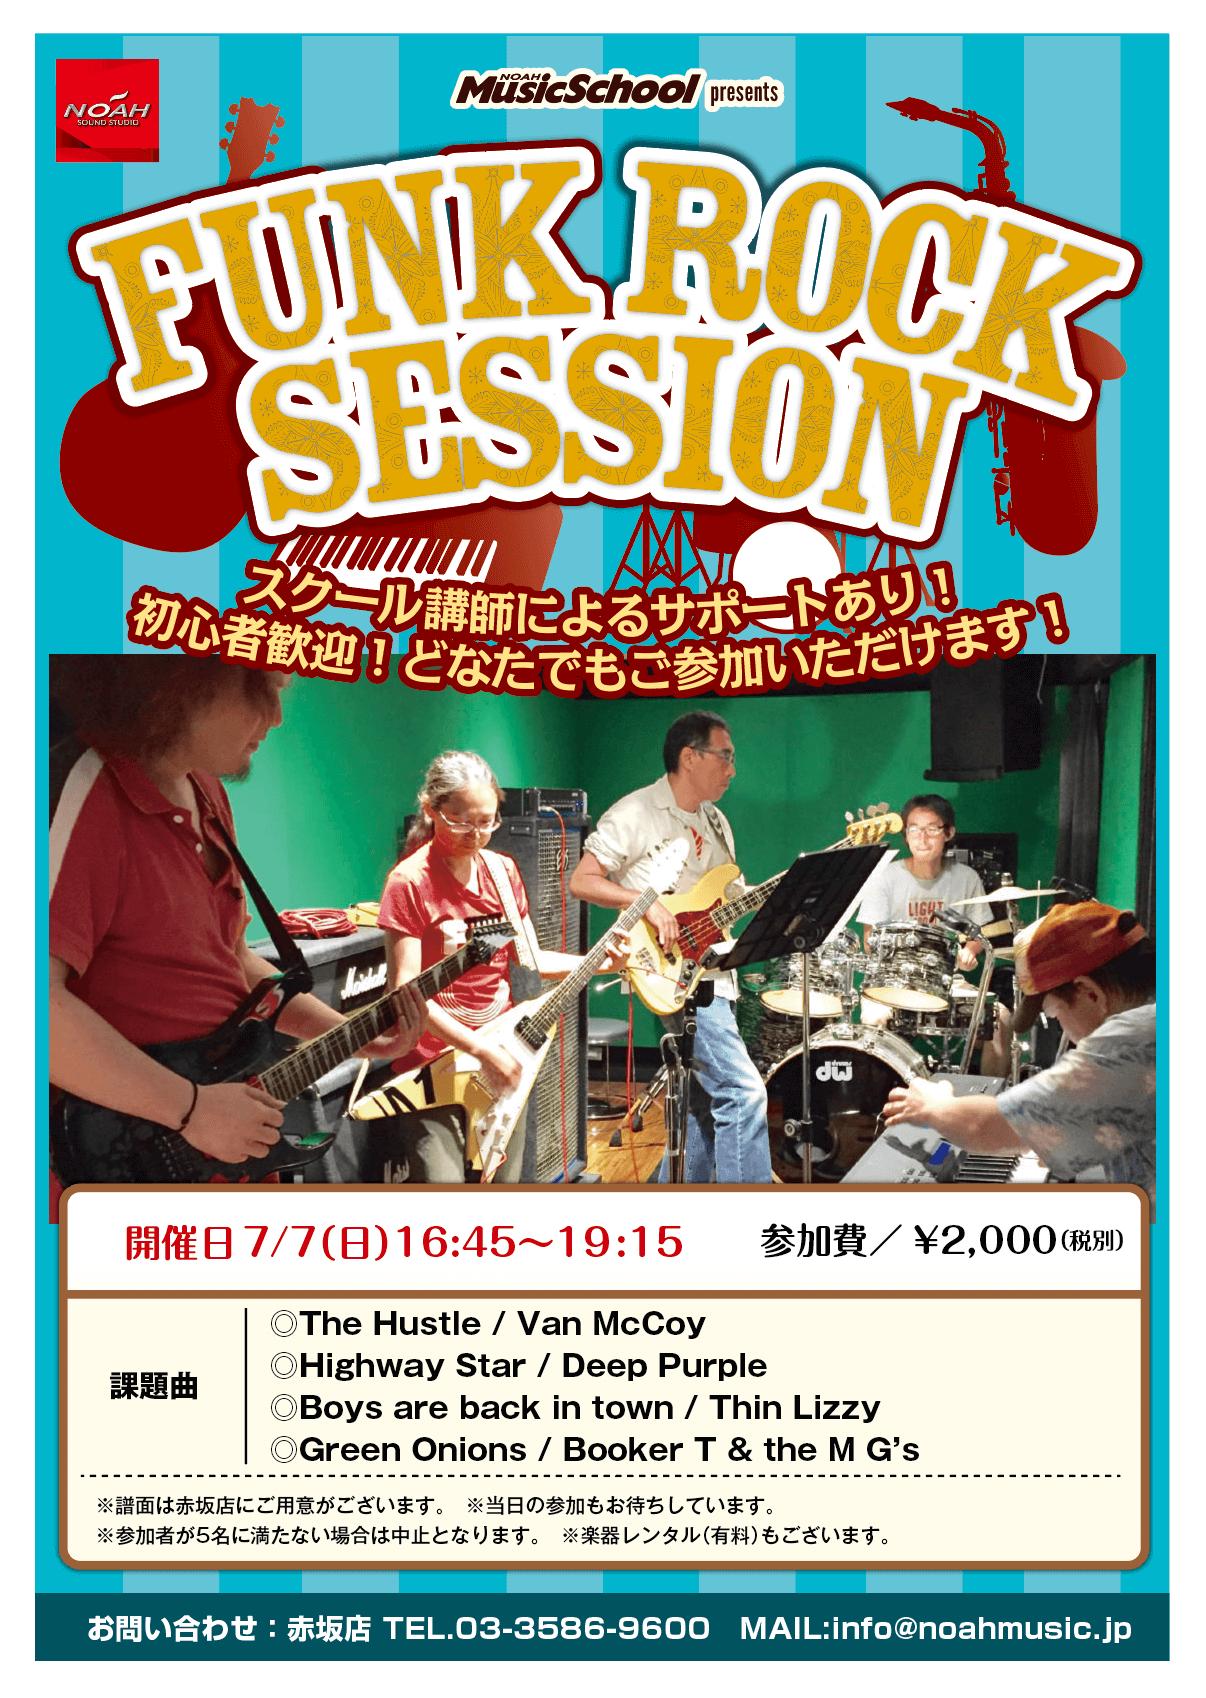 Music school presents FUNK ROCK SESSION 7/7(日)開催!